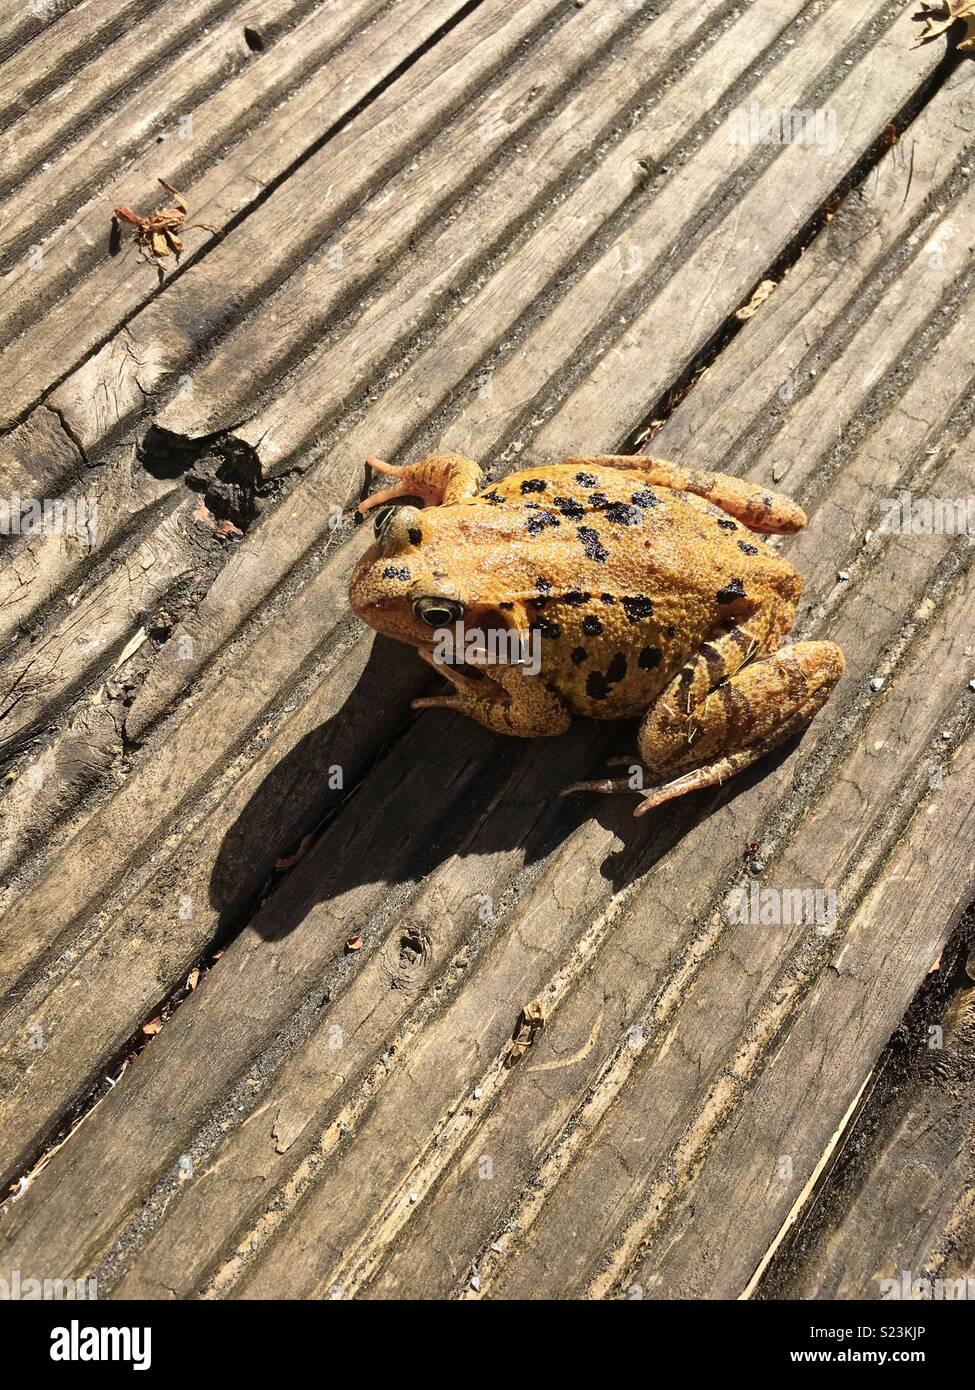 Frog posture - Stock Image